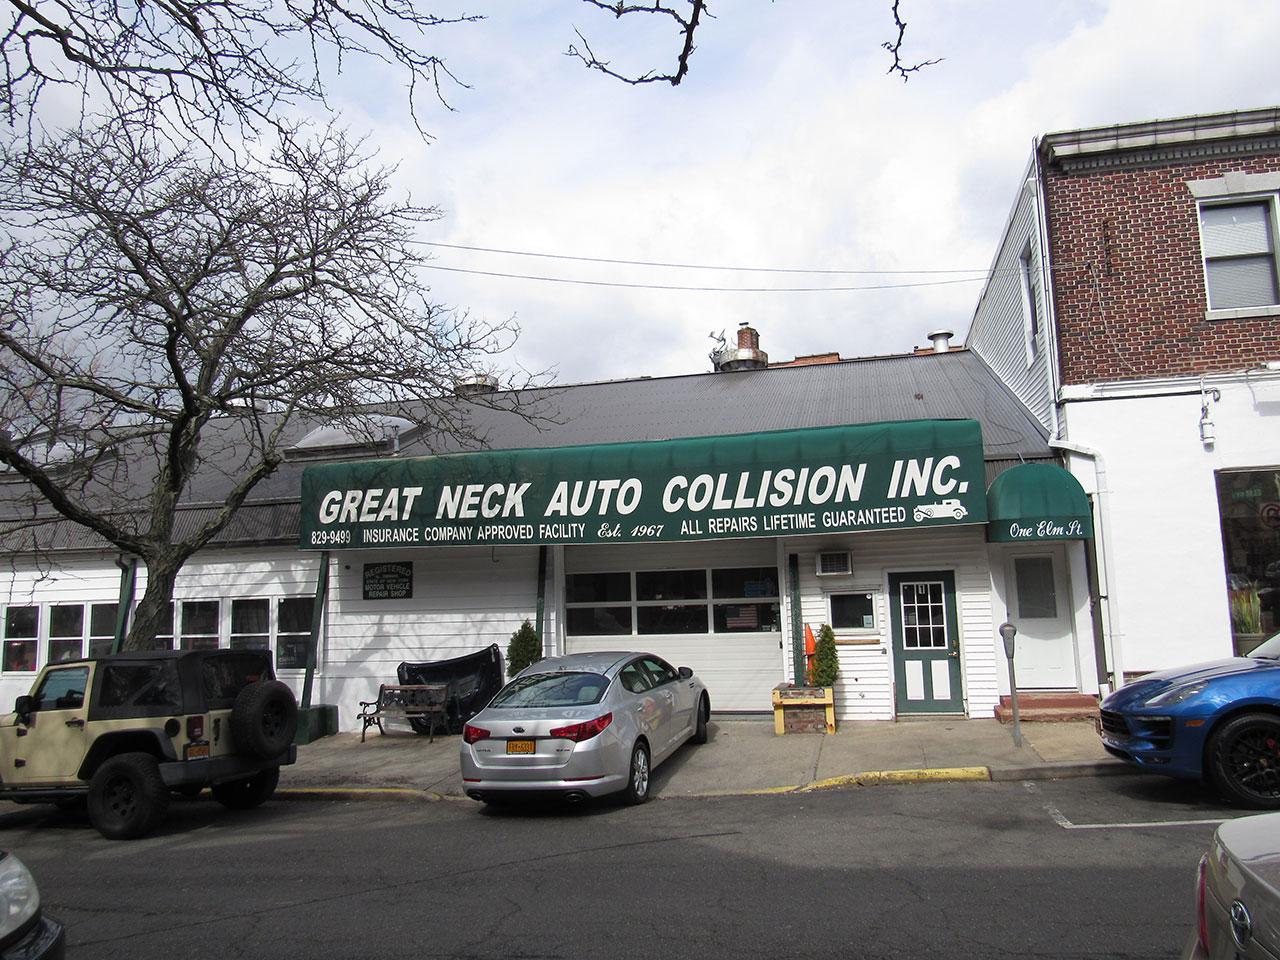 Creat Neck Collision, Inc.